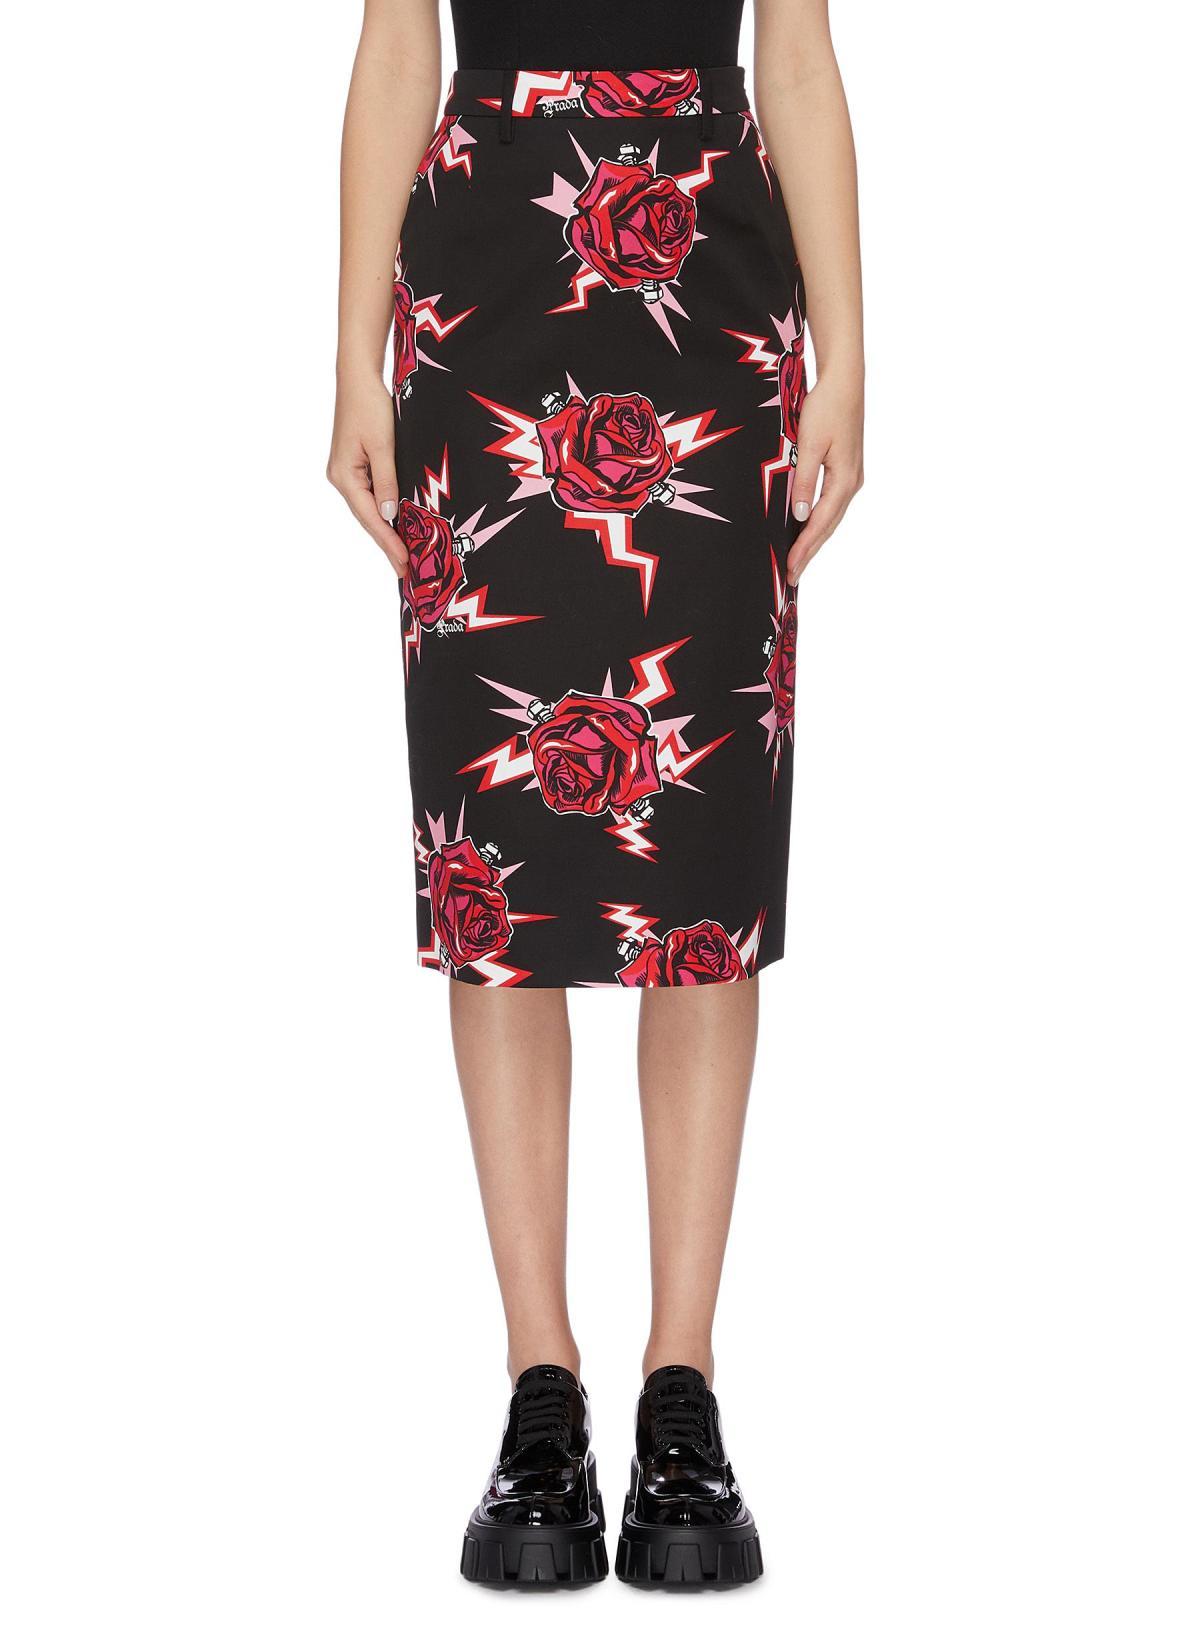 Prada Rose Bolt Print Poplin Skirt HKD$8,550